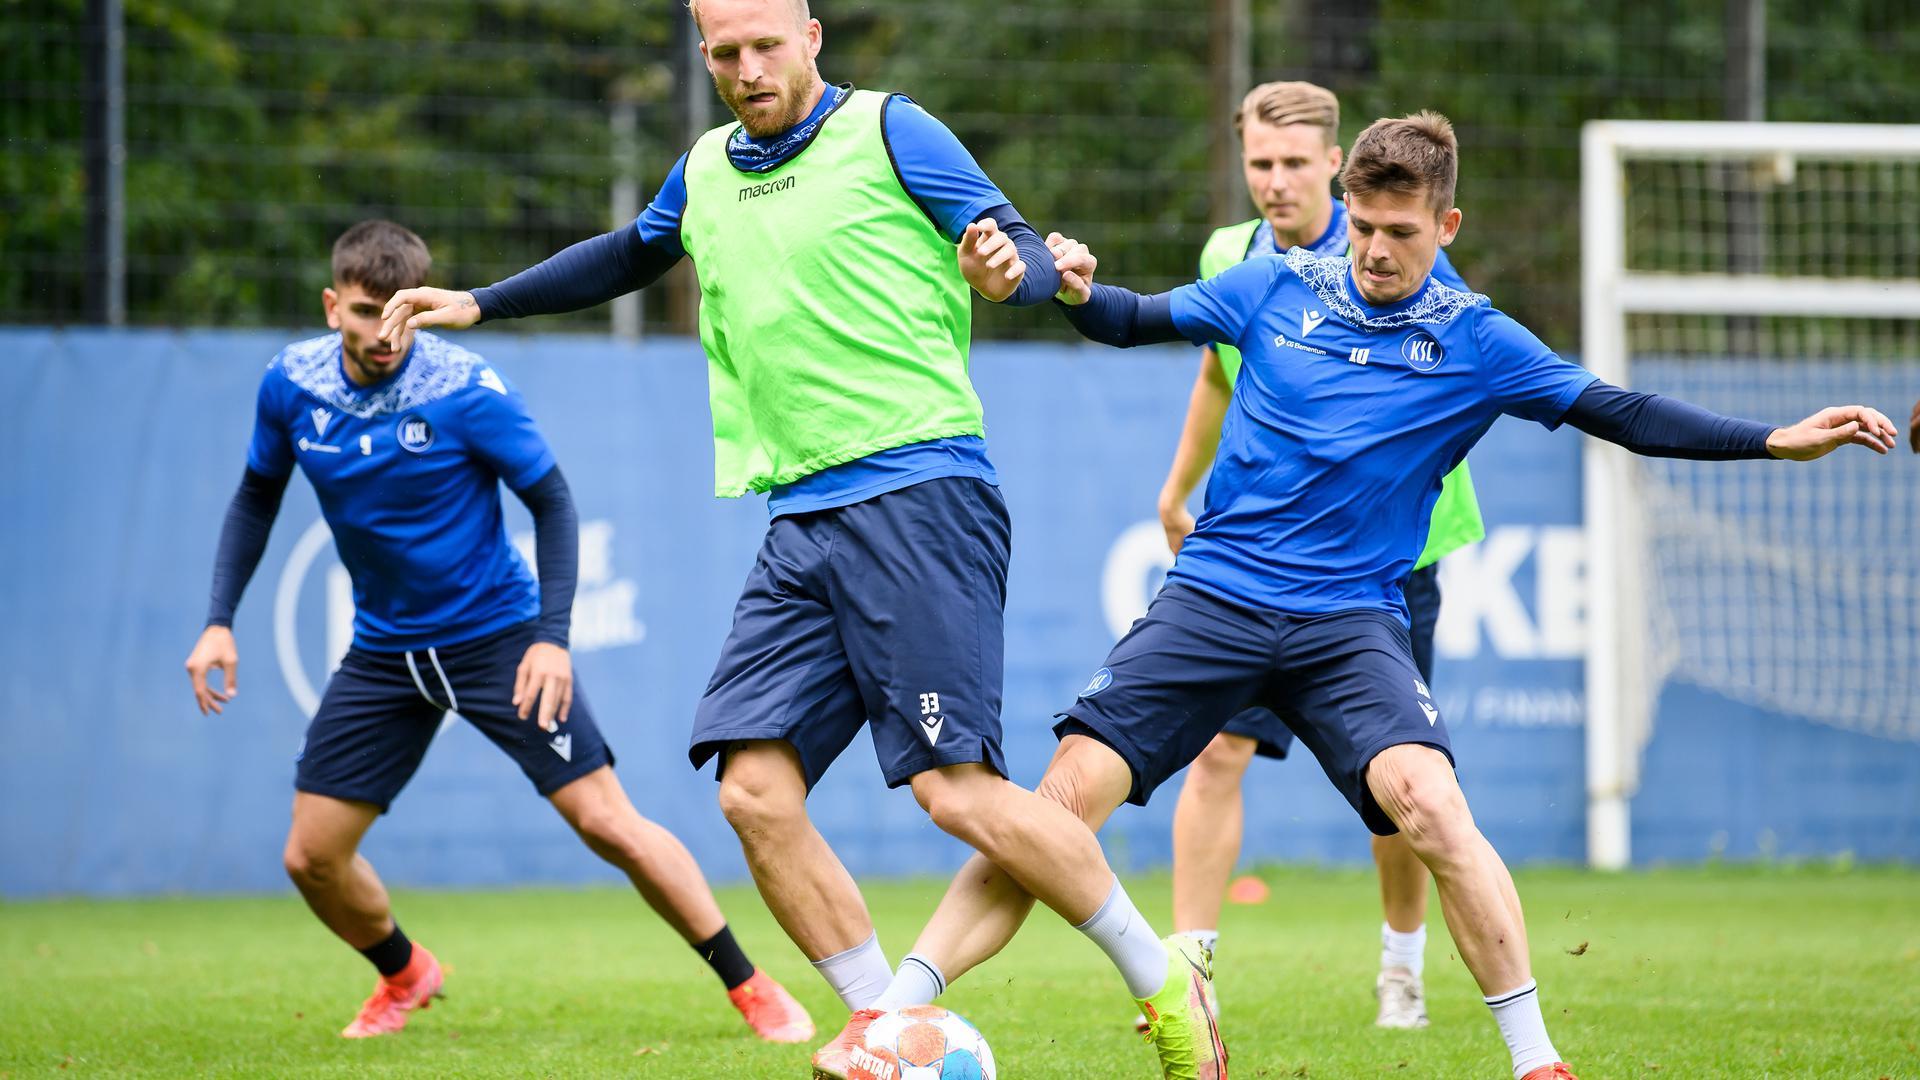 Philipp Hofmann (KSC) im Zweikampf mit Marvin Wanitzek (KSC).  GES/ Fussball/ 2. Bundesliga: Karlsruher SC - Training, 30.08.2021  Football/Soccer: 2. Bundesliga: KSC Training, Karlsruhe, August 30, 2021